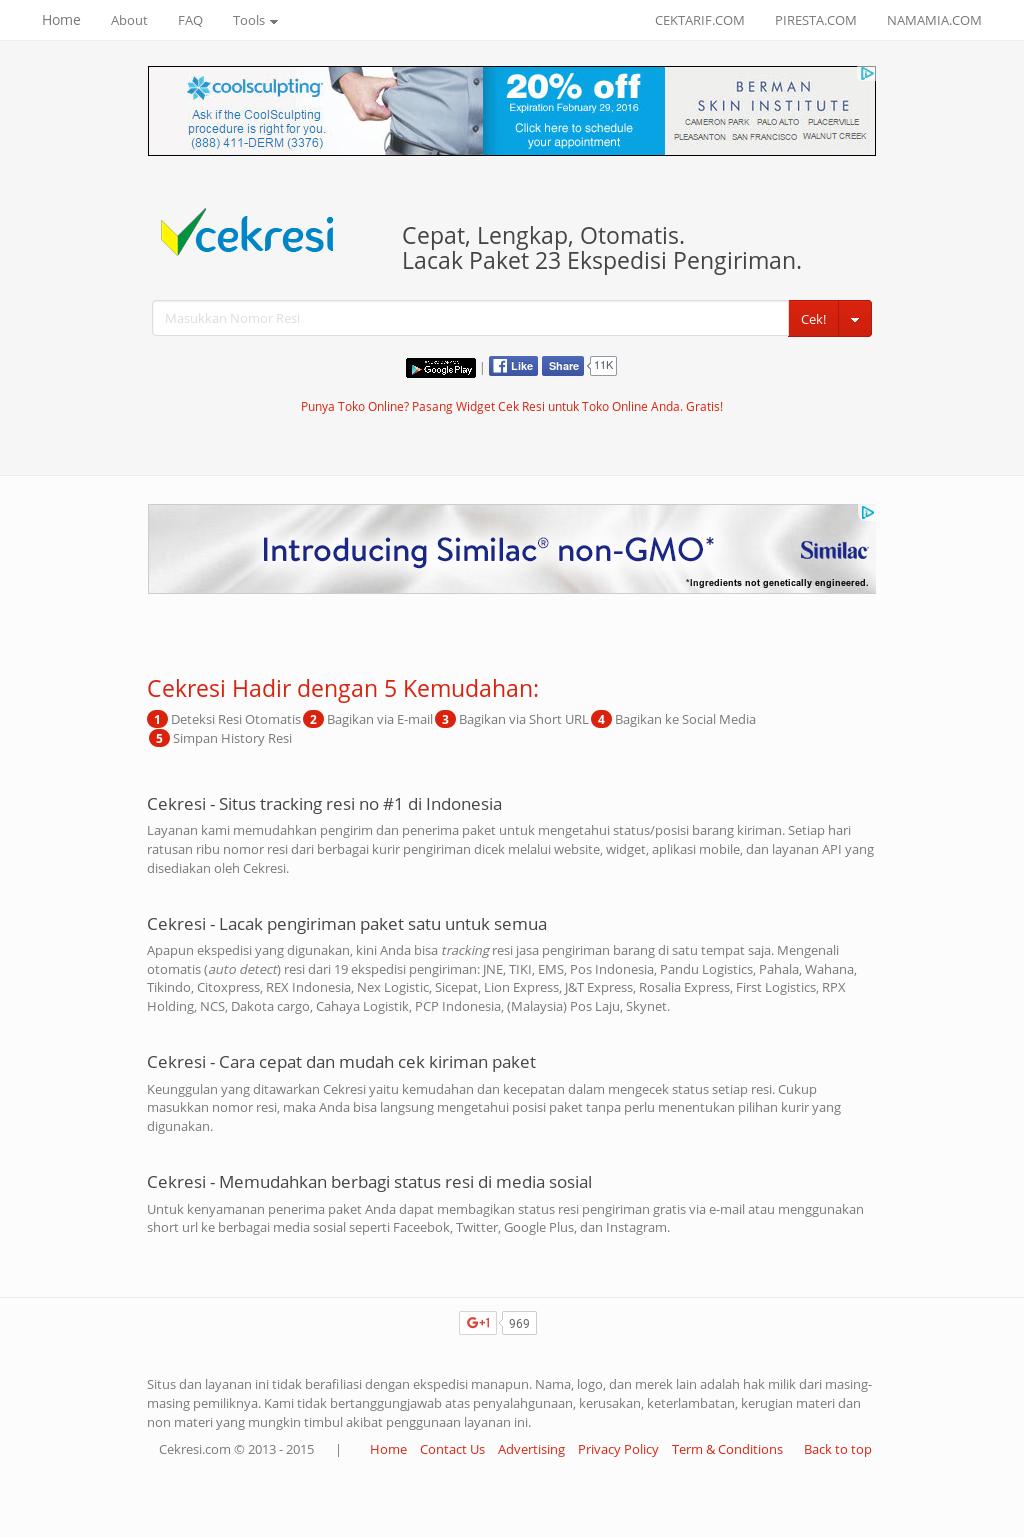 Cekresi Competitors, Revenue and Employees - Owler Company Profile